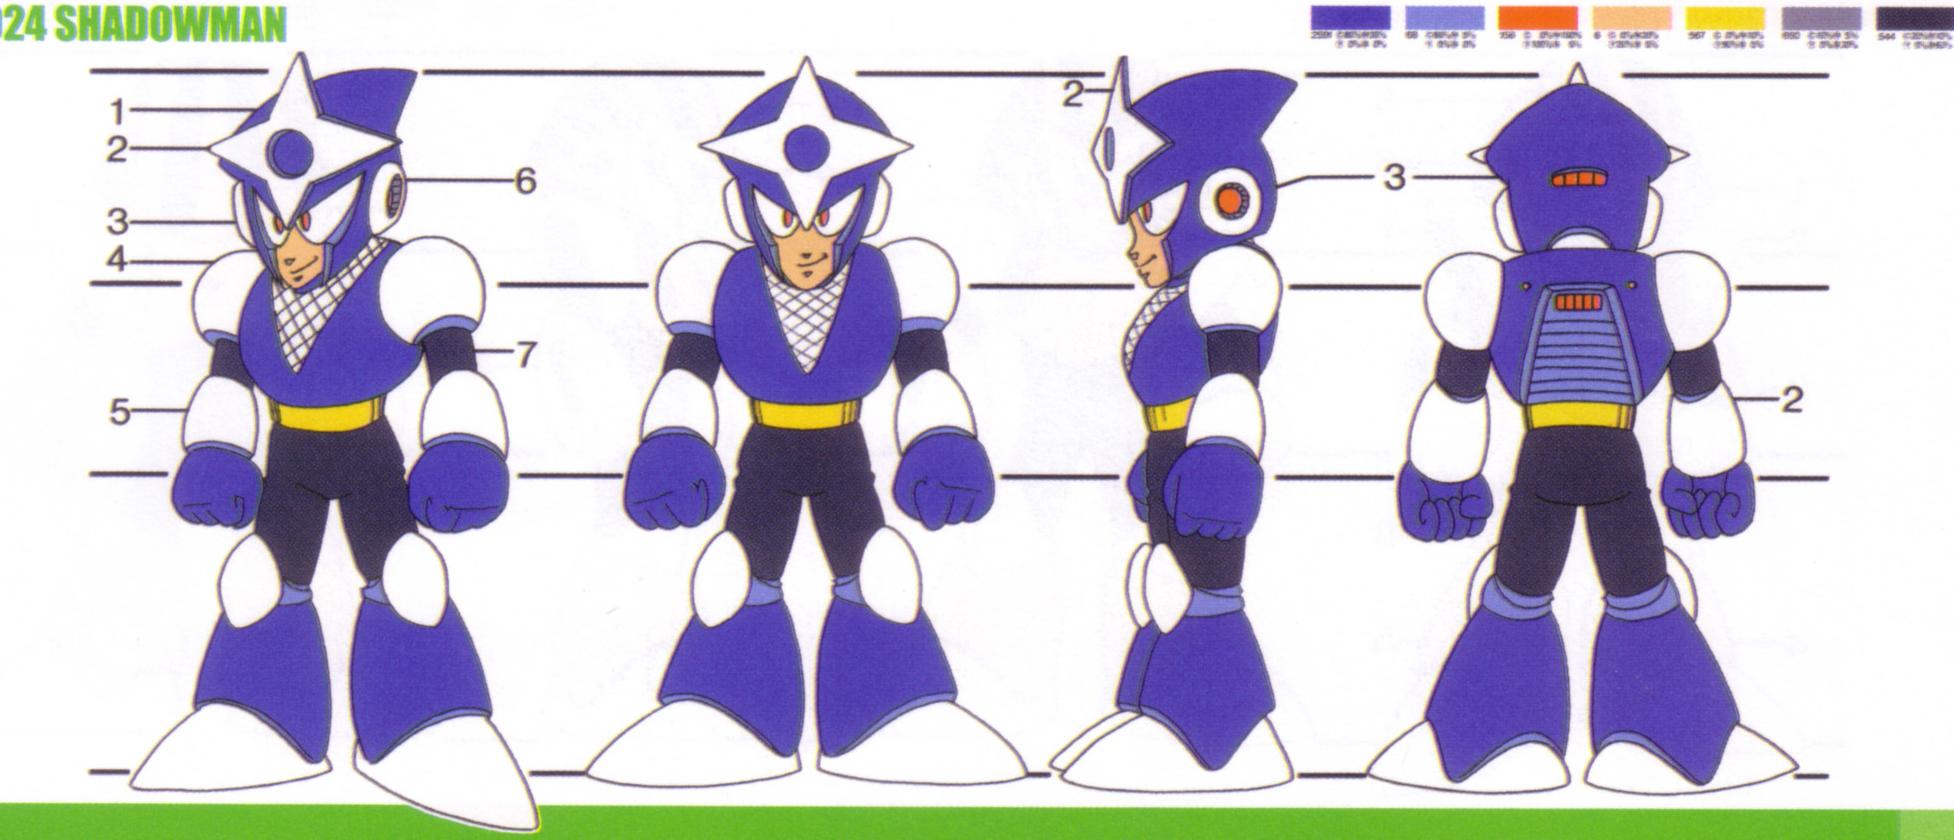 Shadow man mega man google search megaman pinterest mega man shadow man mega man google search voltagebd Images